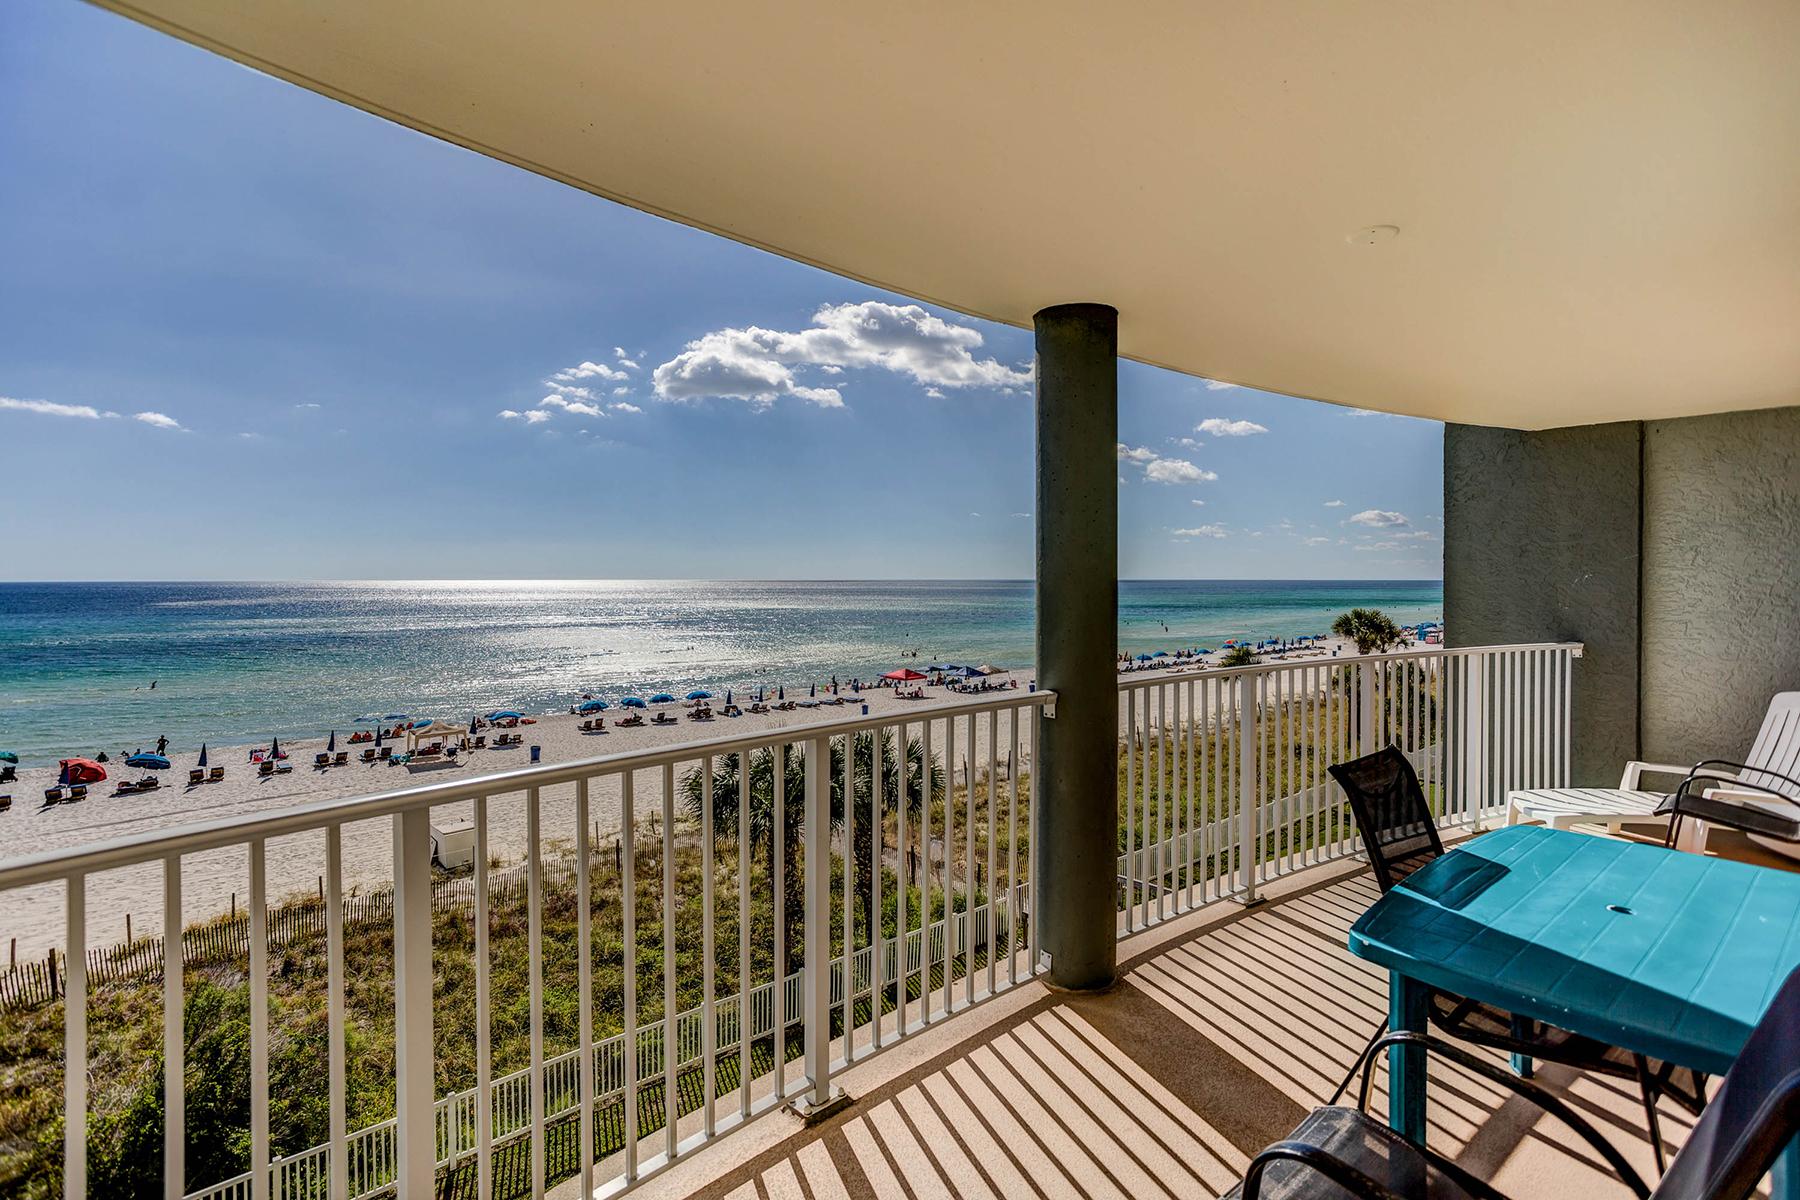 Condomínio para Venda às STUNNING GULF VIEWS FROM AN IDEAL FLOOR HEIGHT 10509 Front Beach Road 302 Panama City, Florida, 32407 Estados Unidos